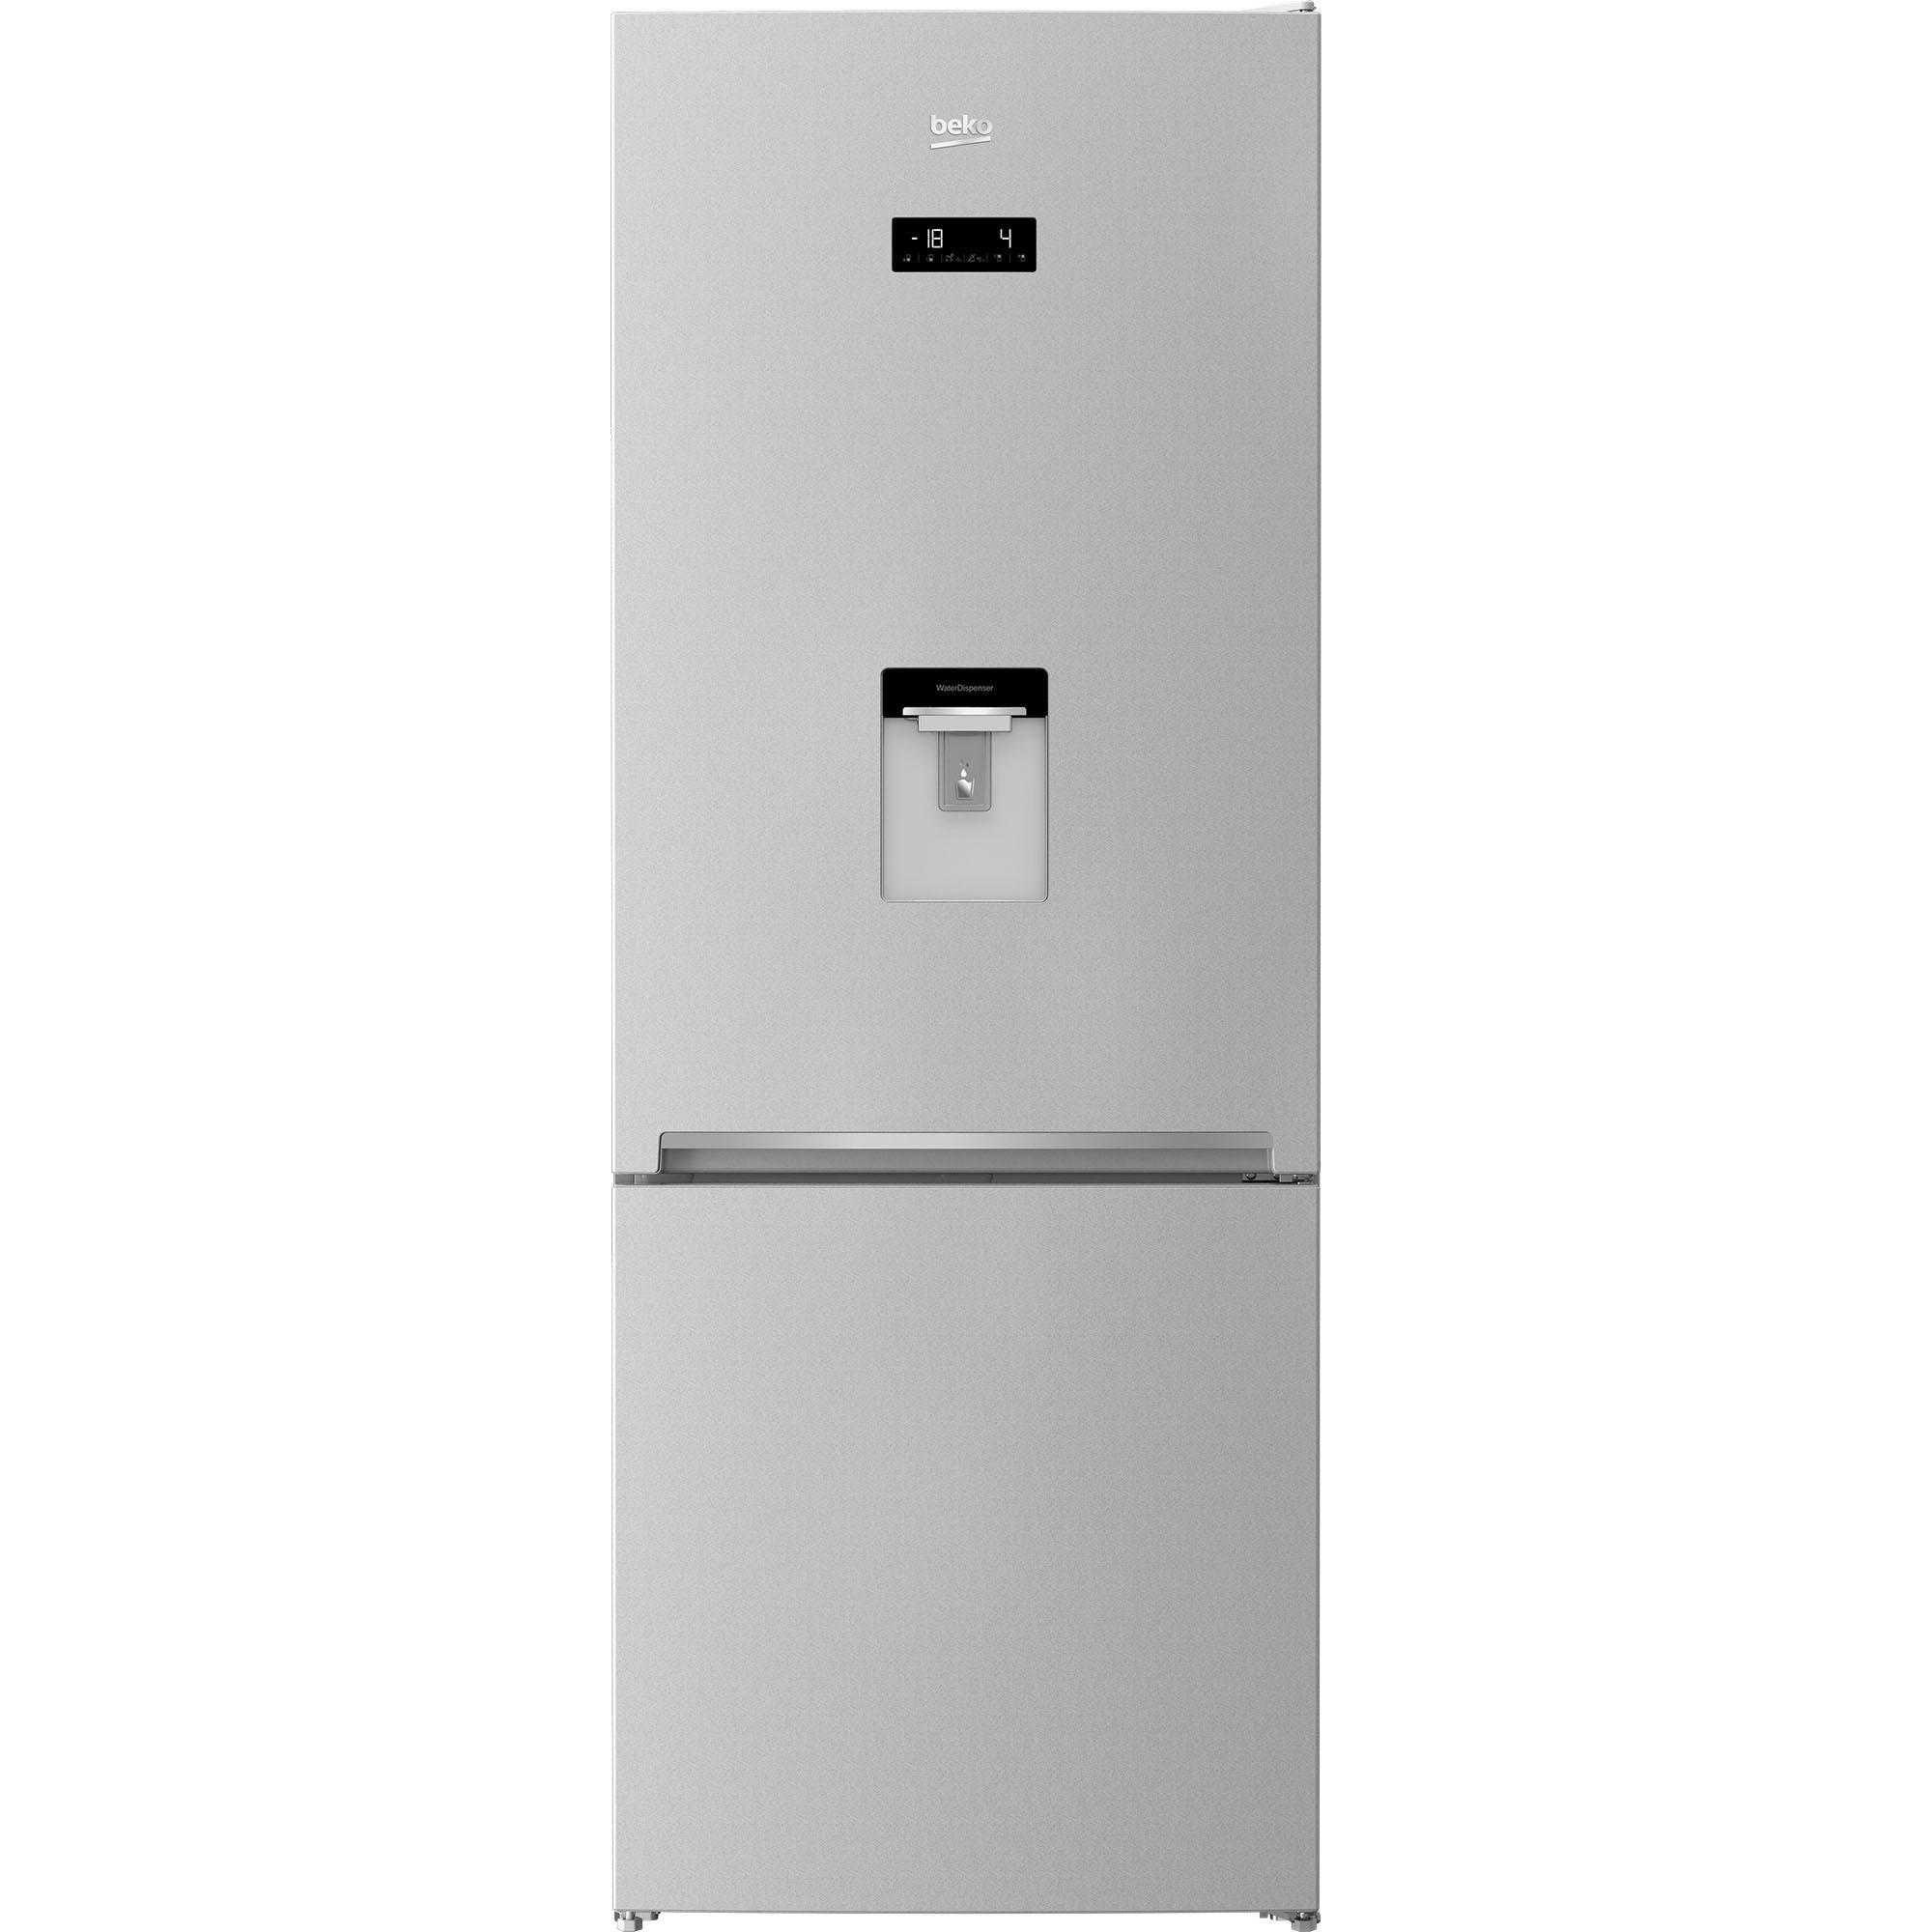 Fotografie Combina frigorifica Beko RCNE560E40DZMN, 510 l, NeoFrost Dual Cooling, HarvestFresh, EverFresh, Dozator de apa, Clasa E, H 192 cm, Gri Sidef